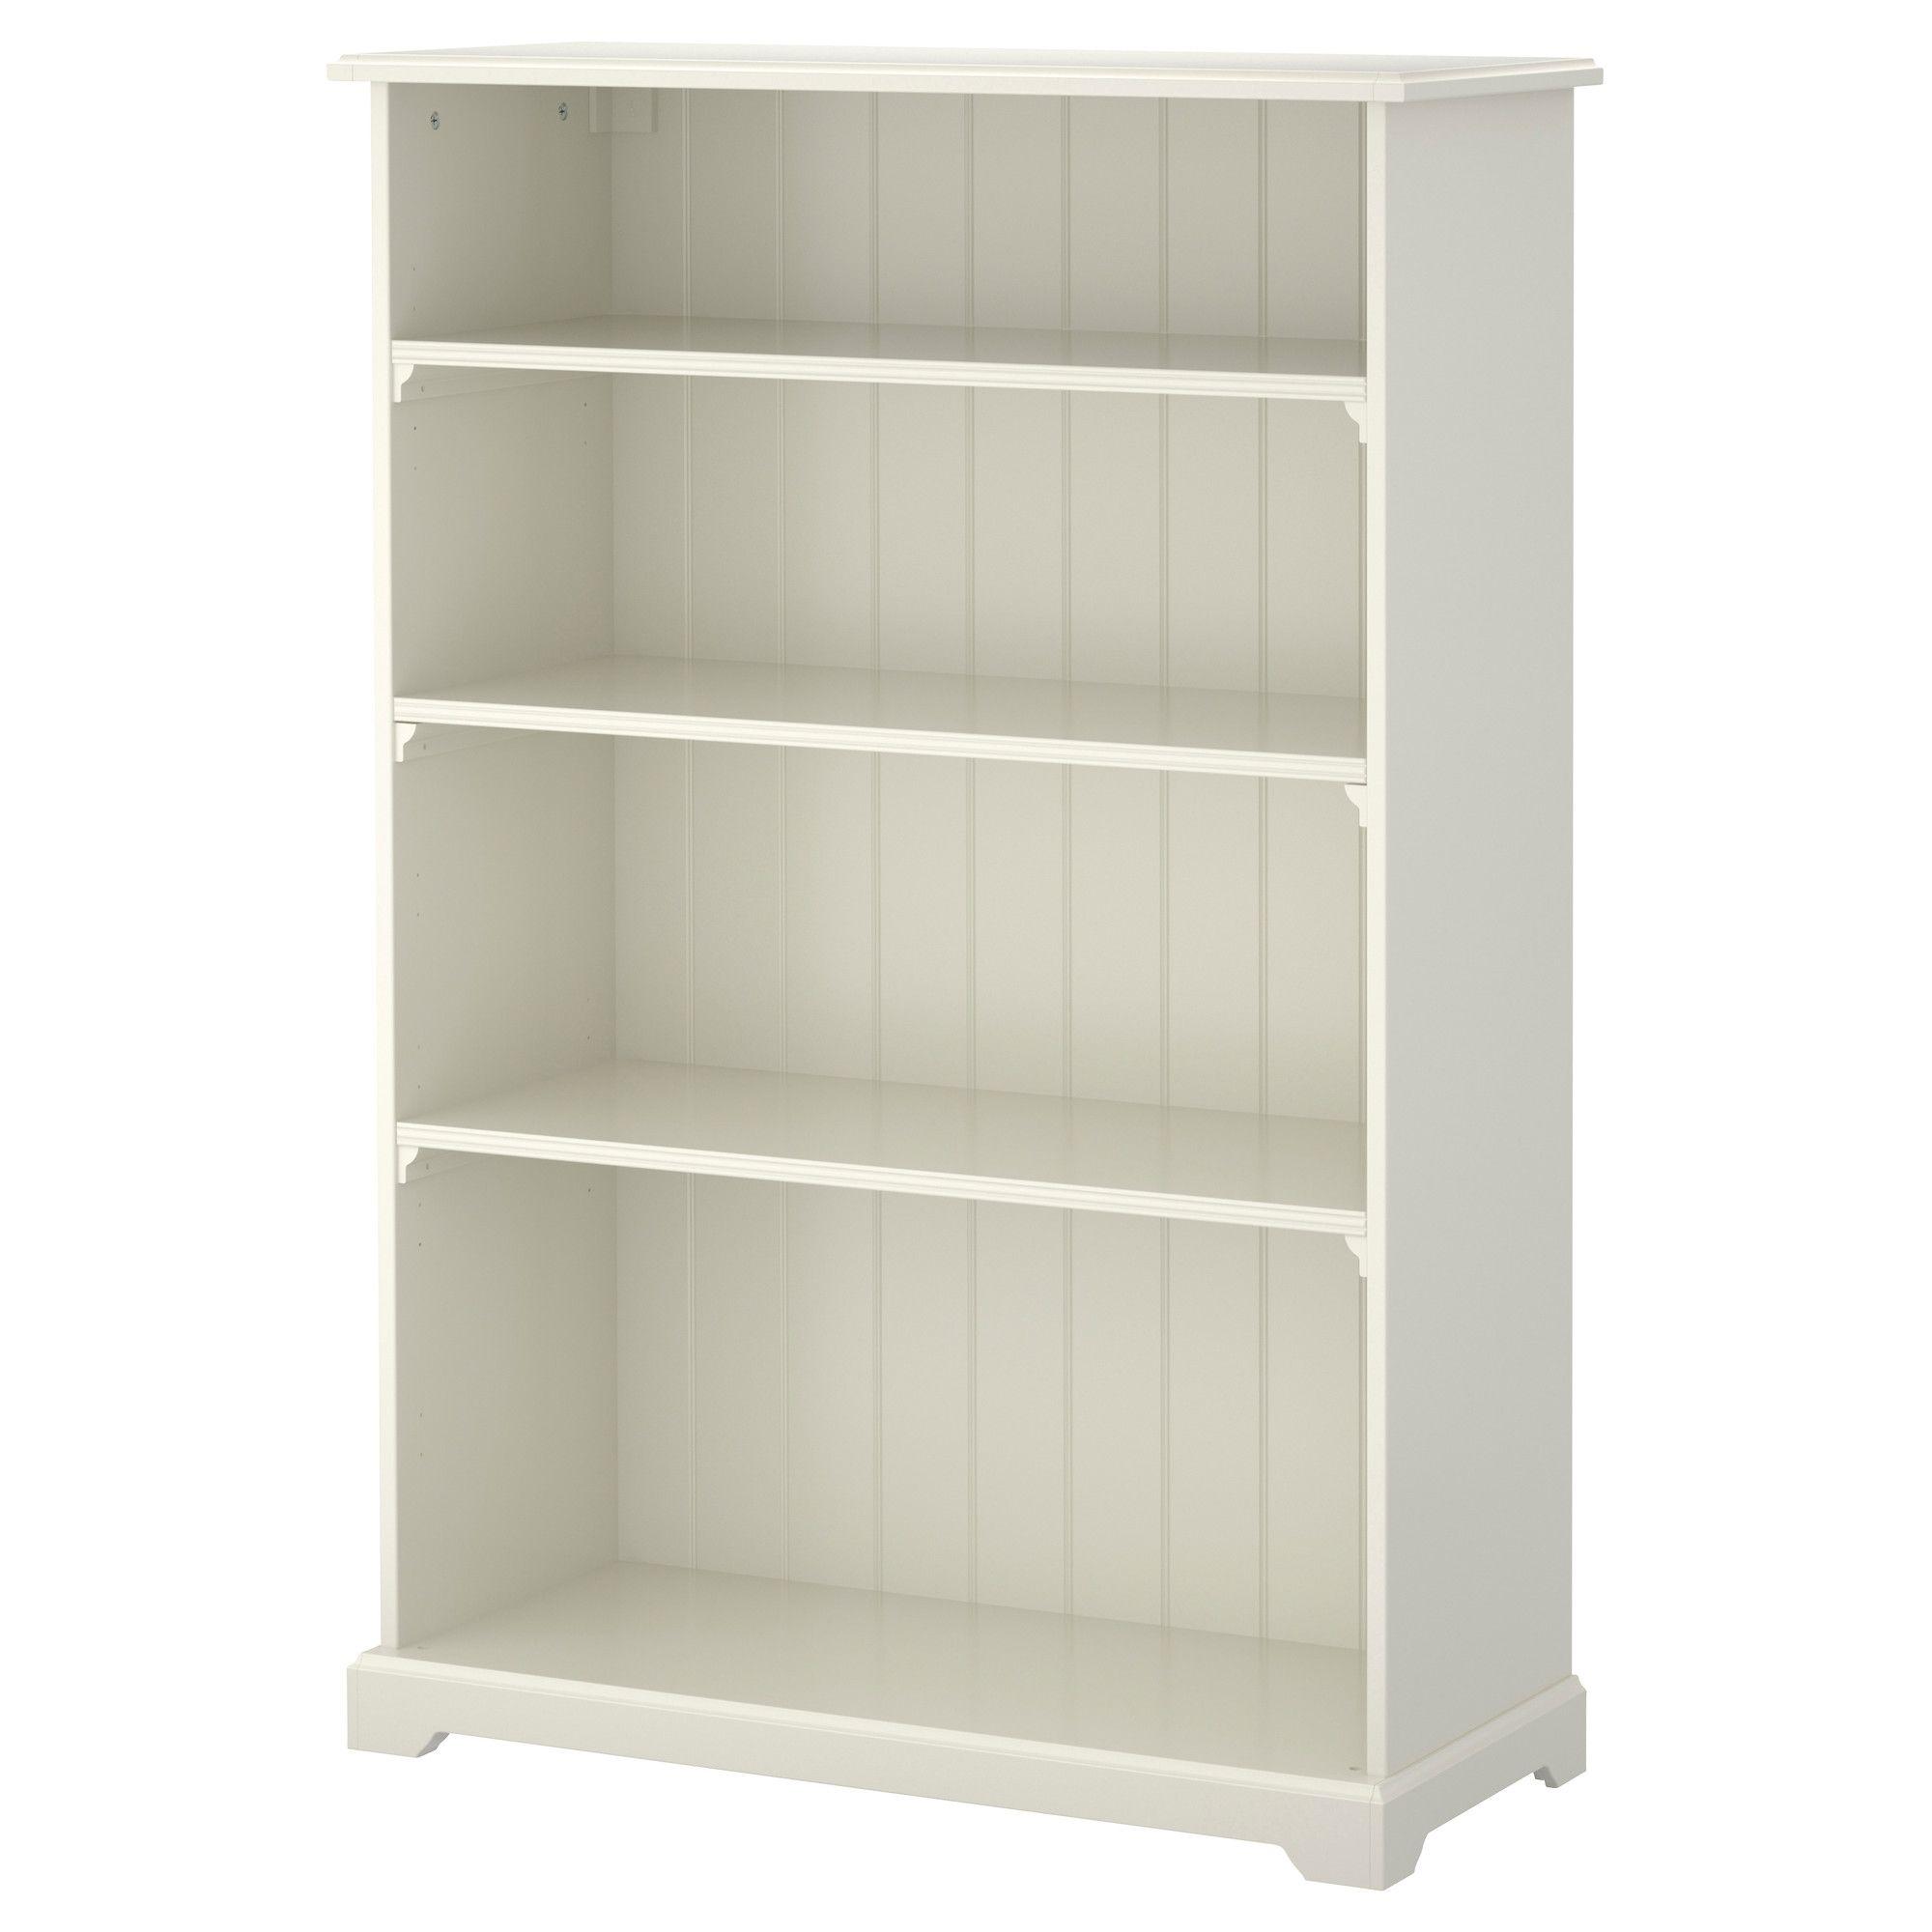 LIATORP Boekenkast - IKEA | Atelier 1858 | Pinterest